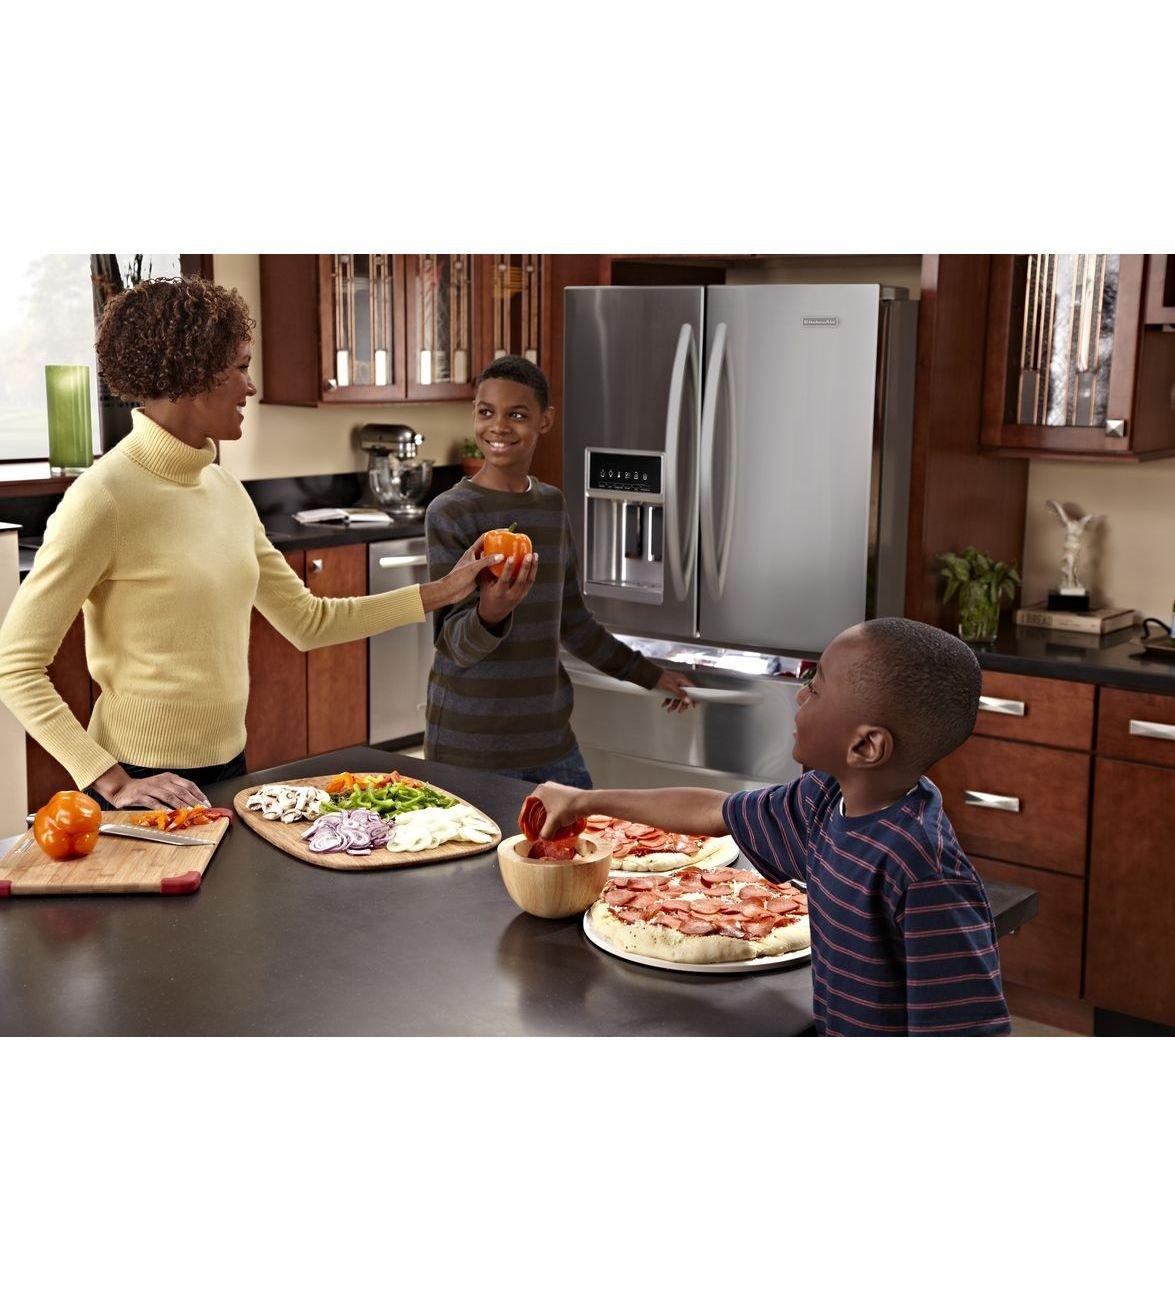 Amazon.com: KitchenAid Architect Series II KFXS25RYMS 36 25.0 Cu. Ft.  French Door Refrigerator: Appliances